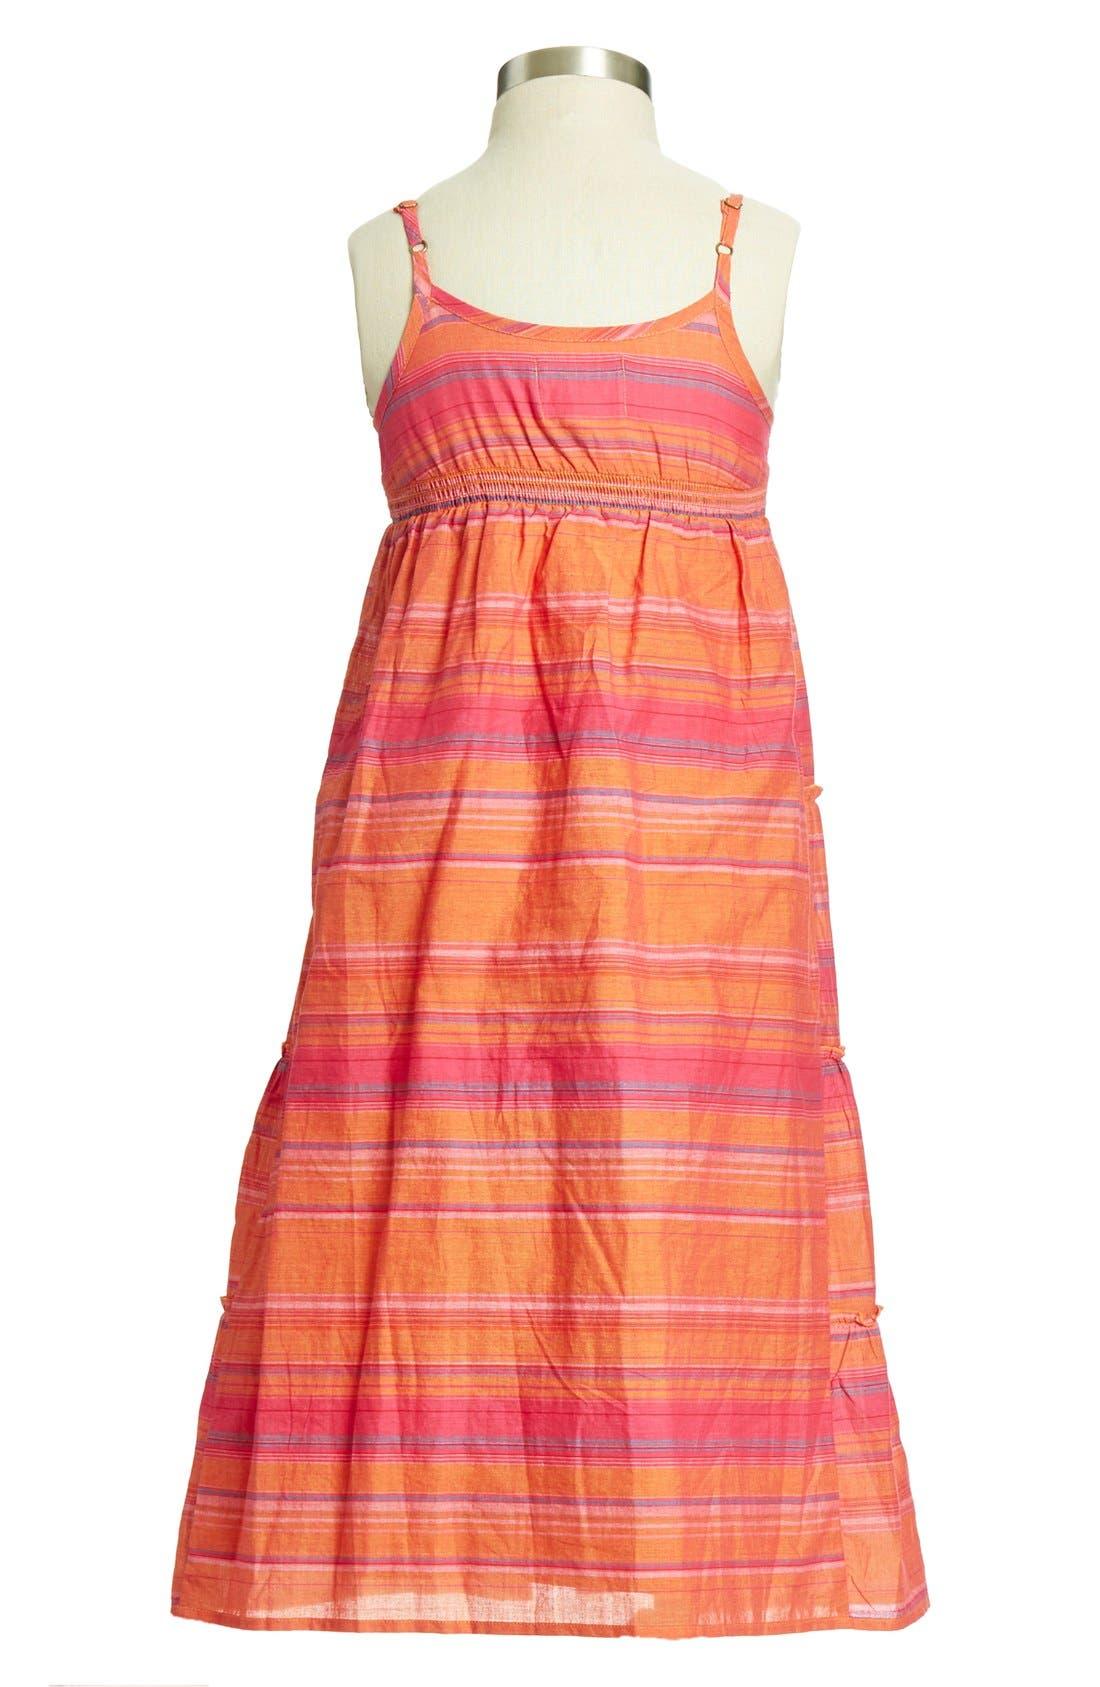 Alternate Image 2  - Peek 'Marigold' Cotton Dress (Toddler Girls, Little Girls & Big Girls)